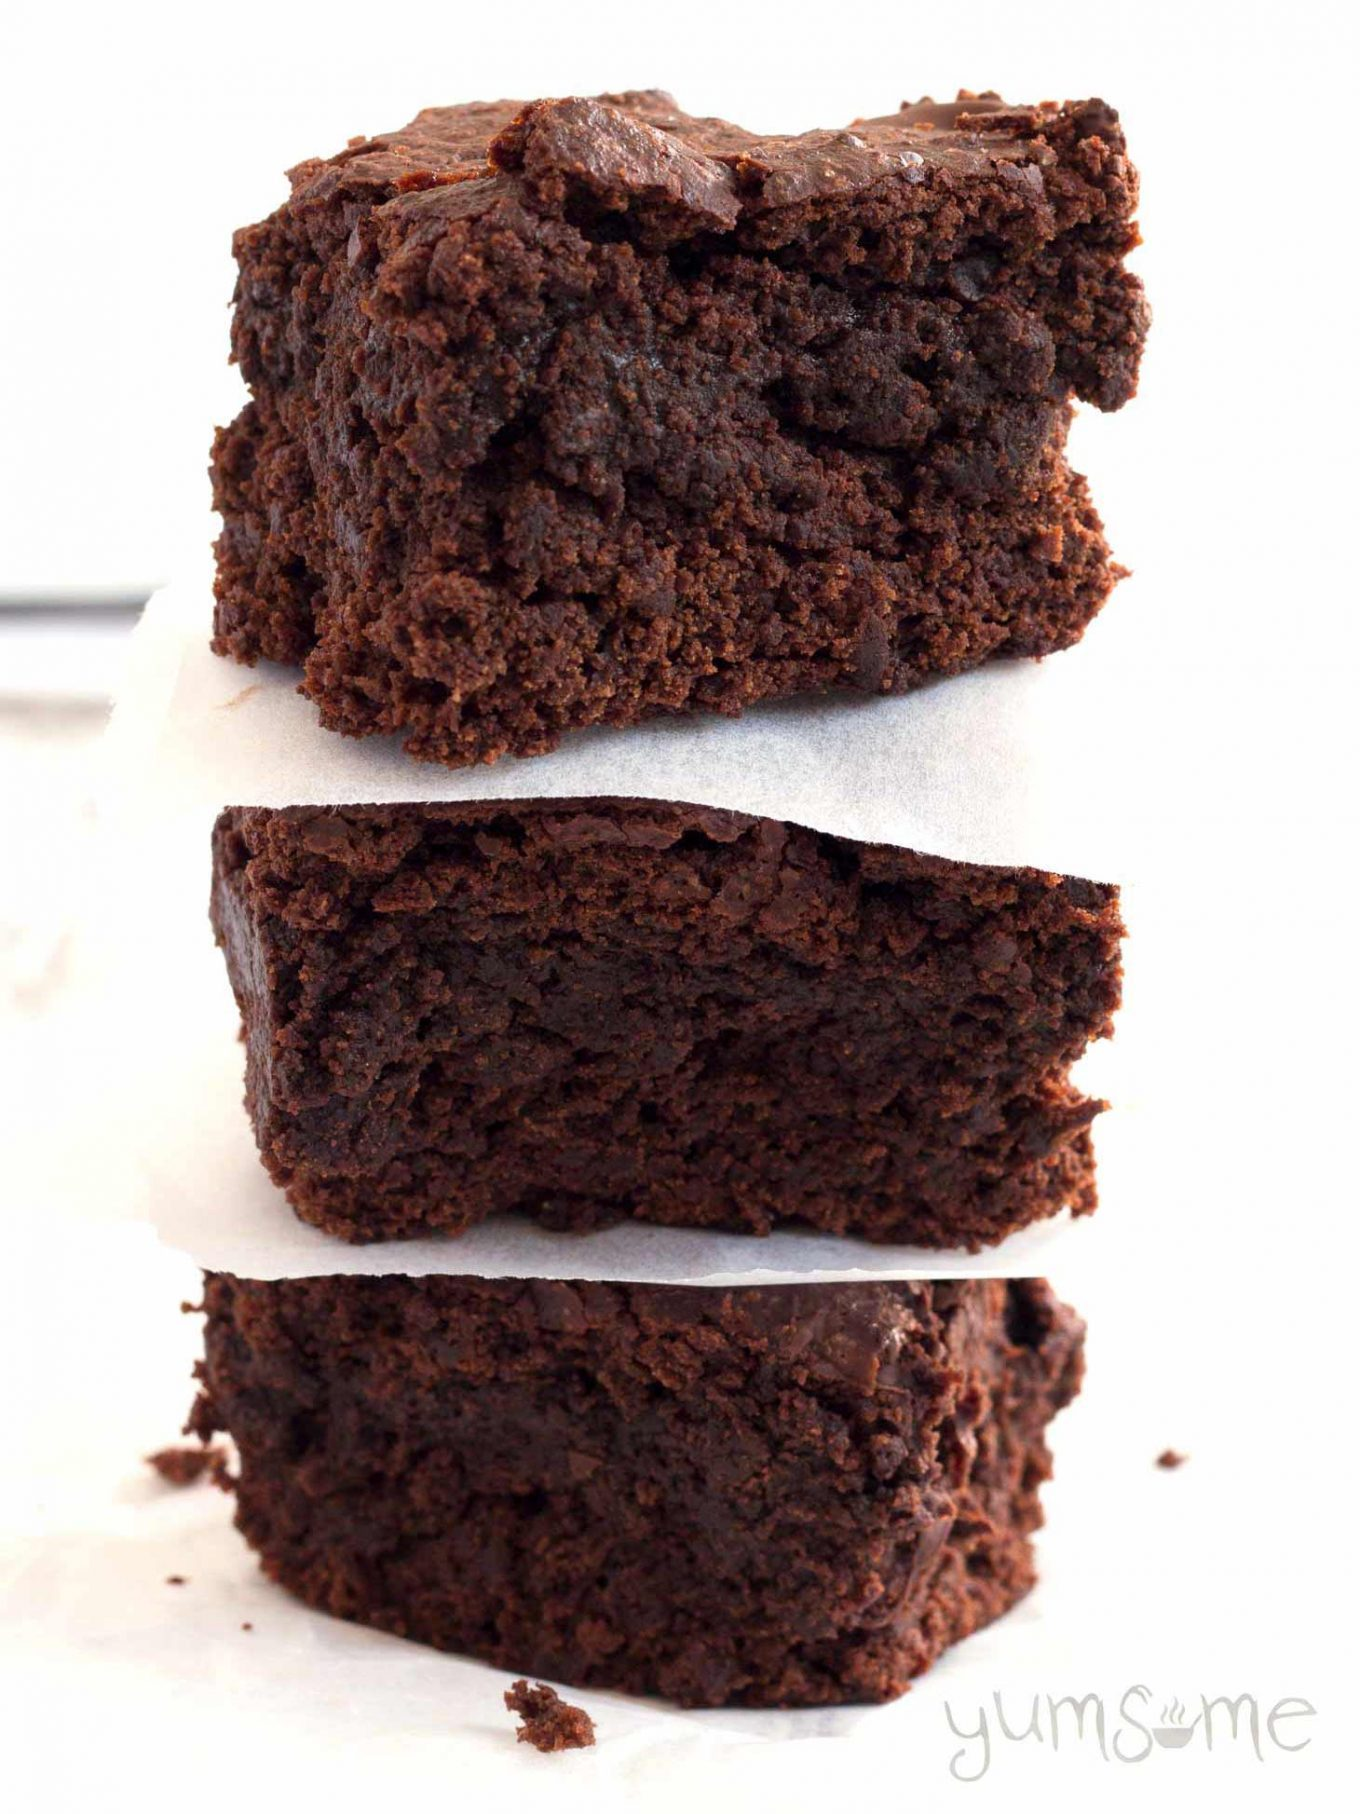 A stack of three perfect vegan brownies.